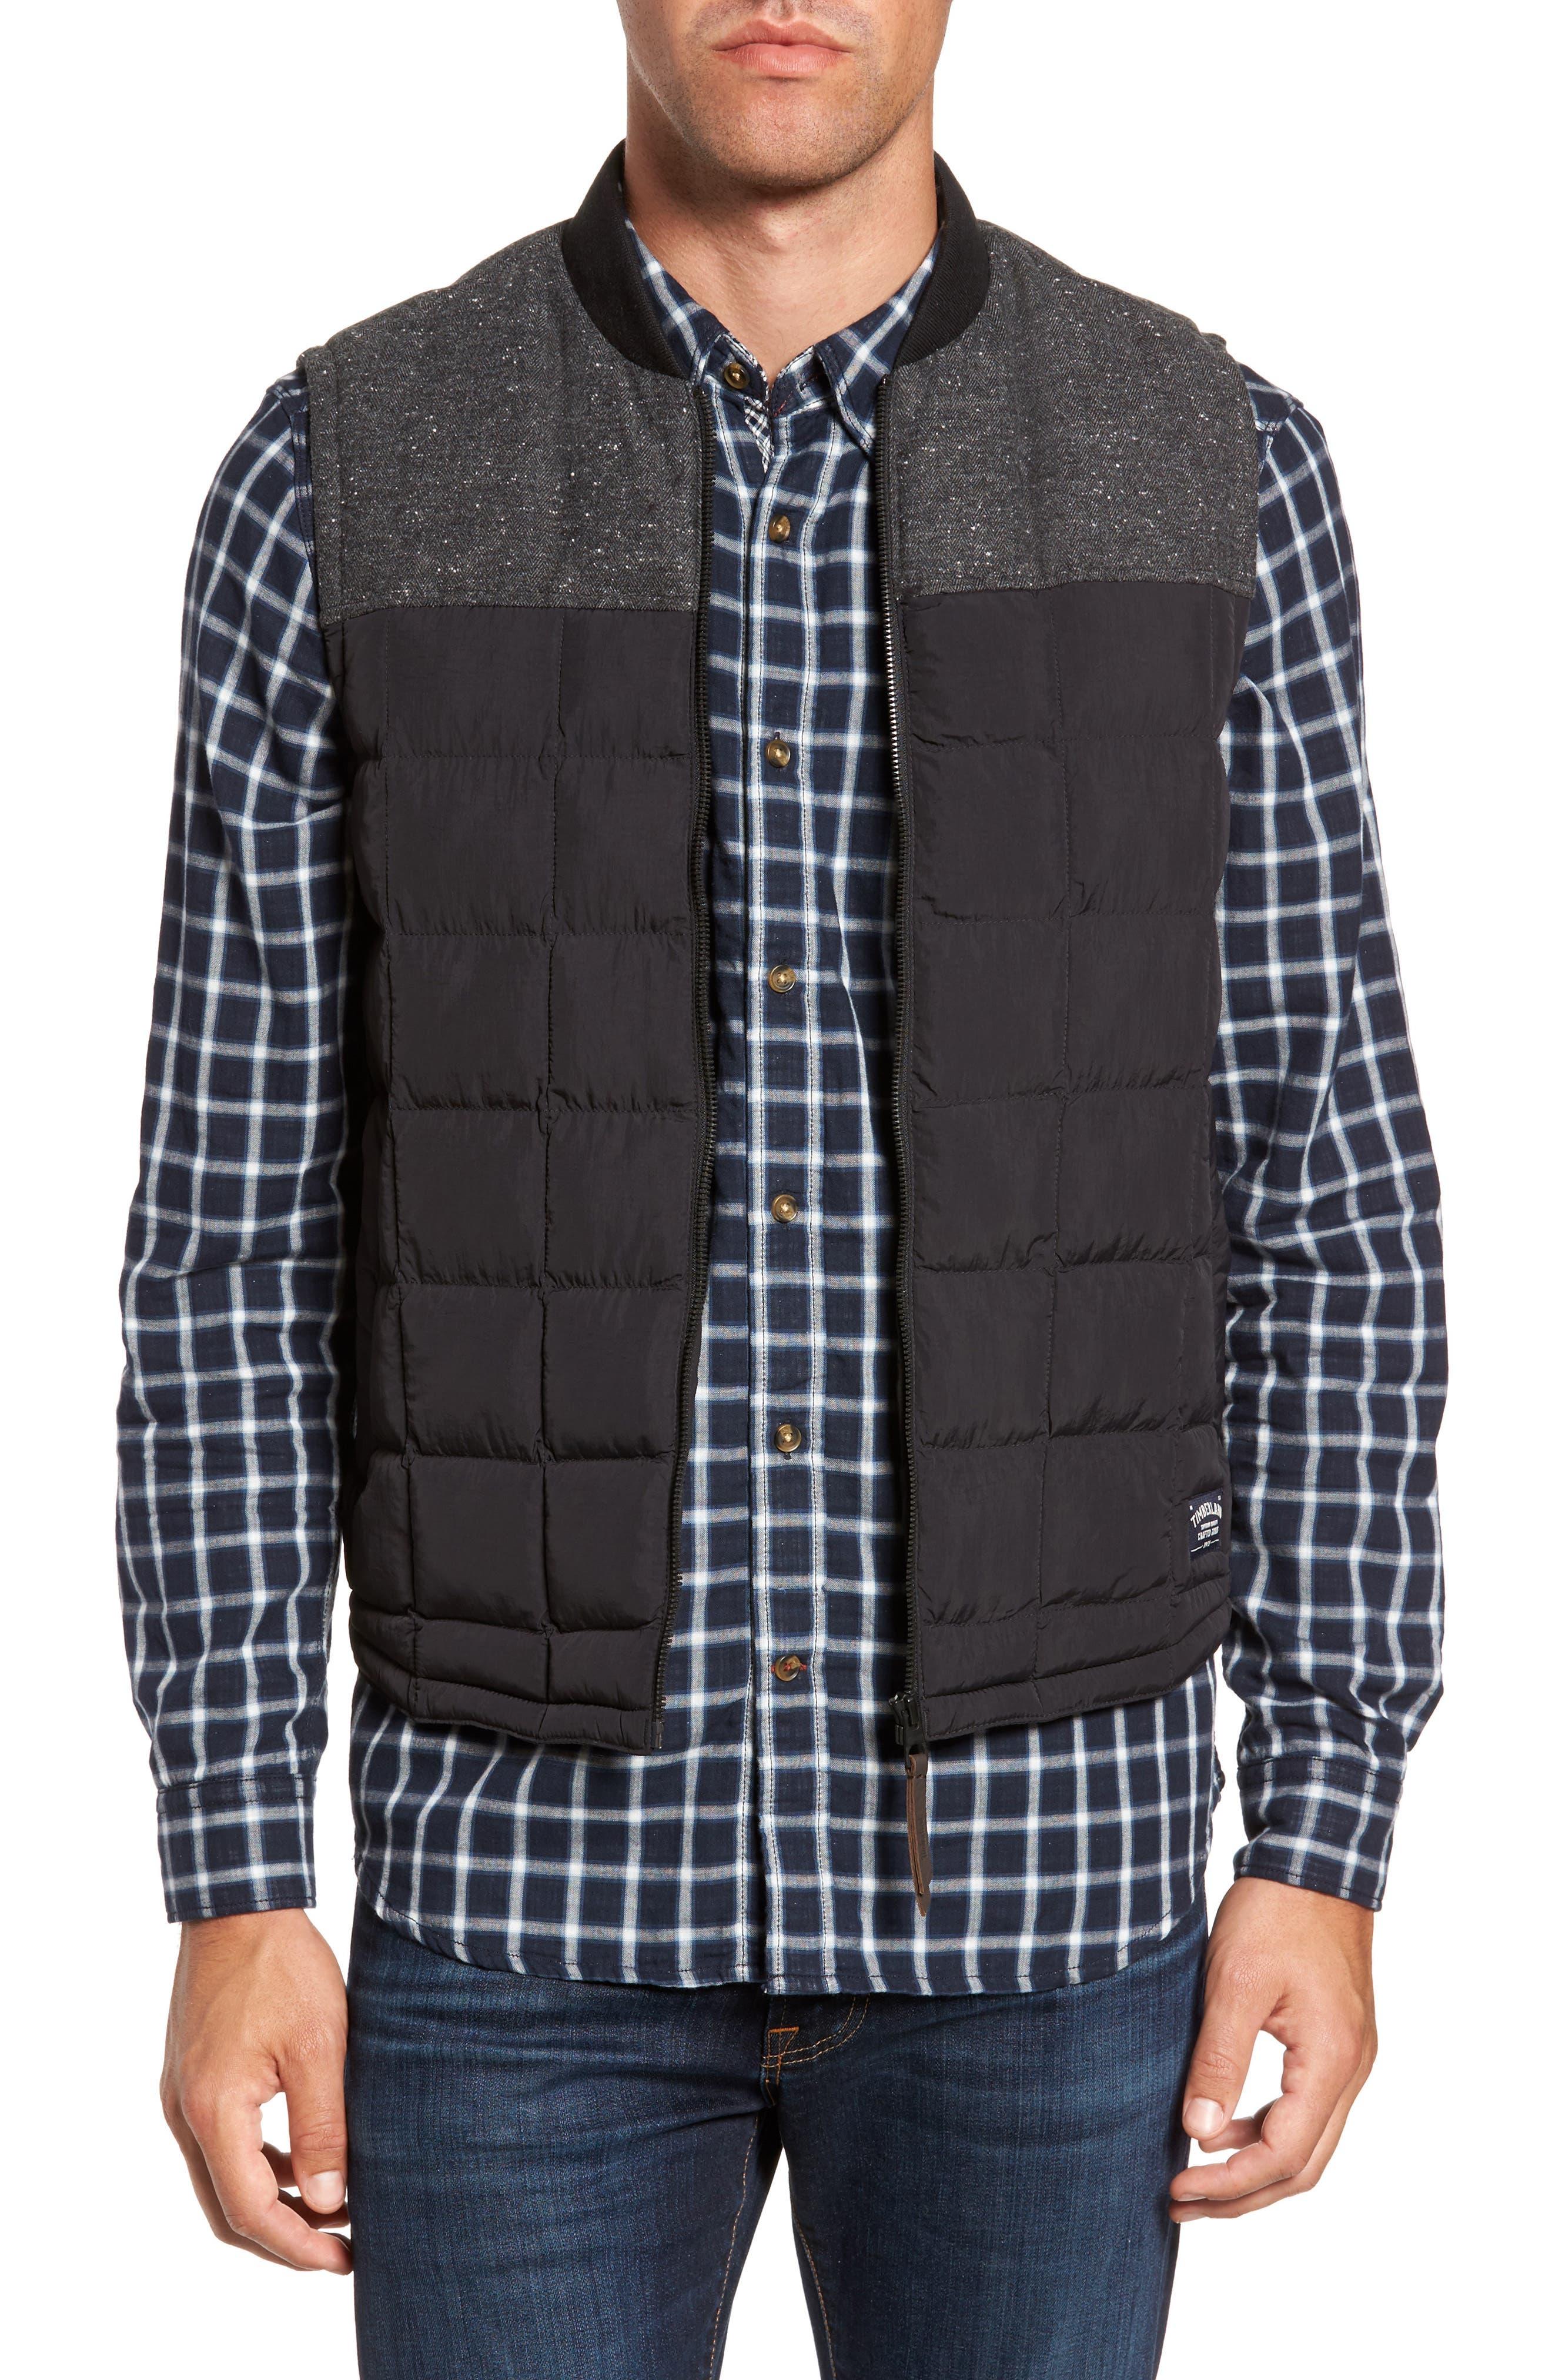 Alternate Image 1 Selected - Timberland® Skye Peak Mixed Media Vest